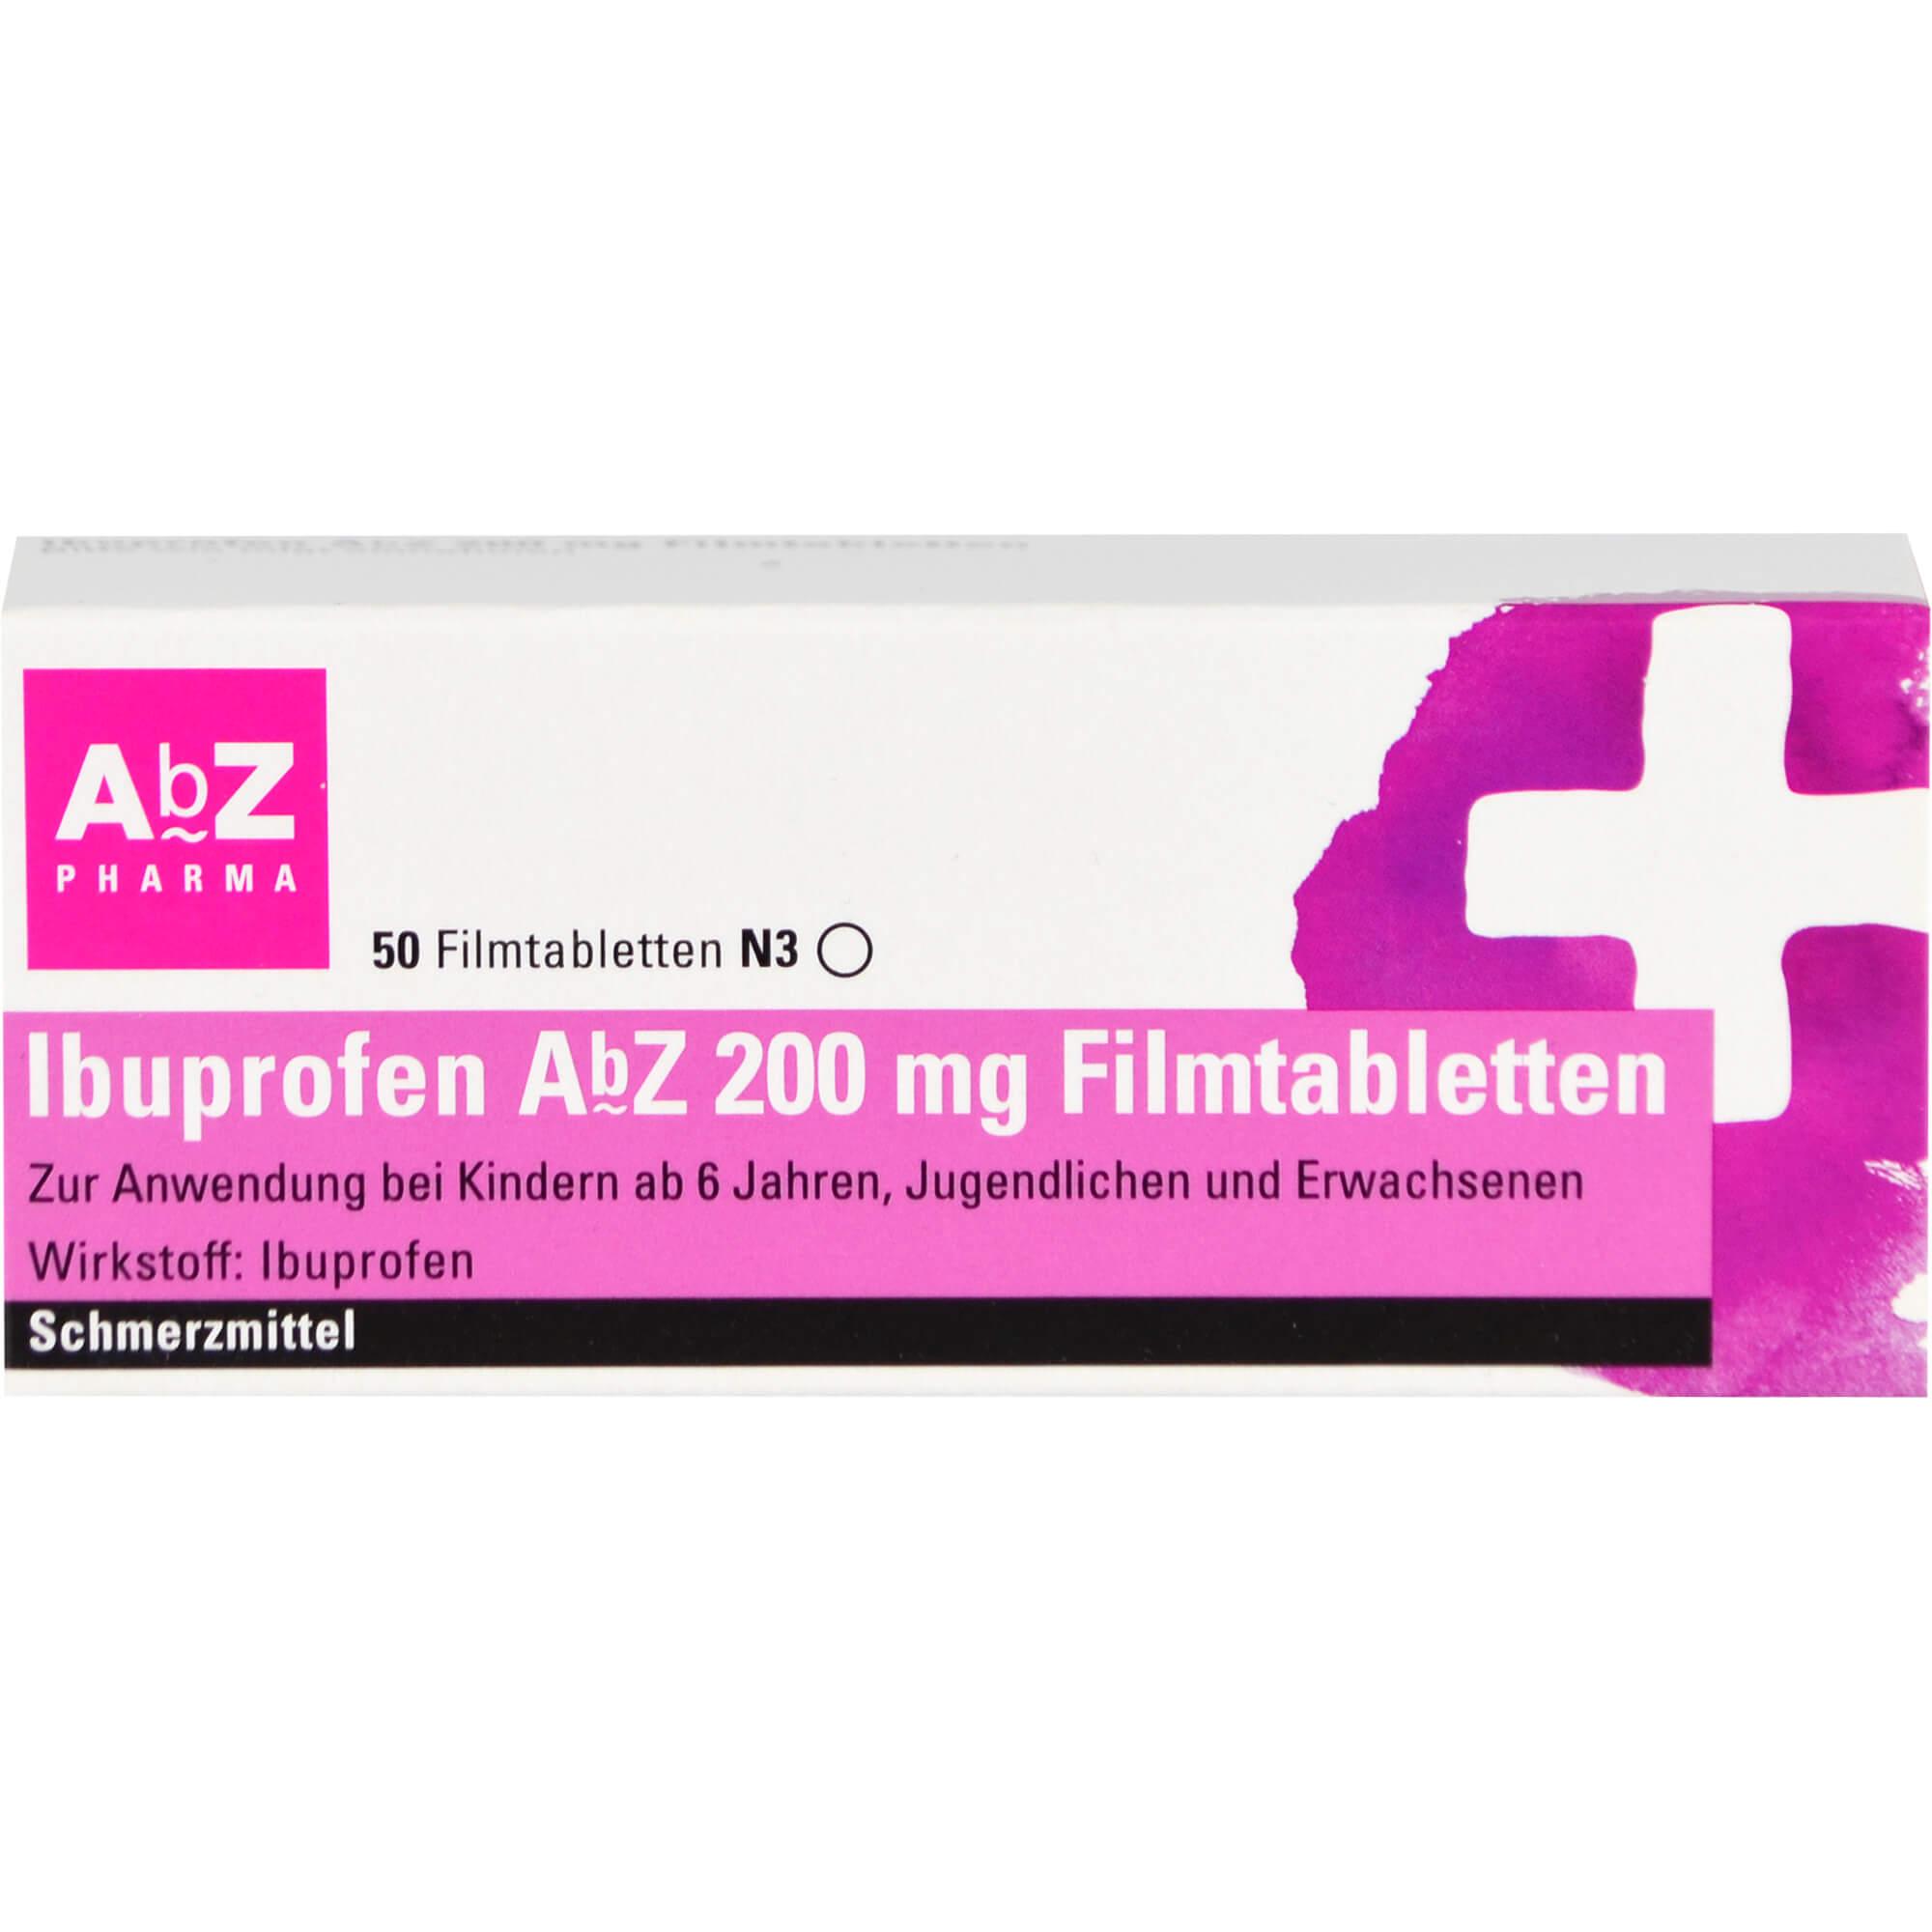 IBUPROFEN-AbZ-200-mg-Filmtabletten